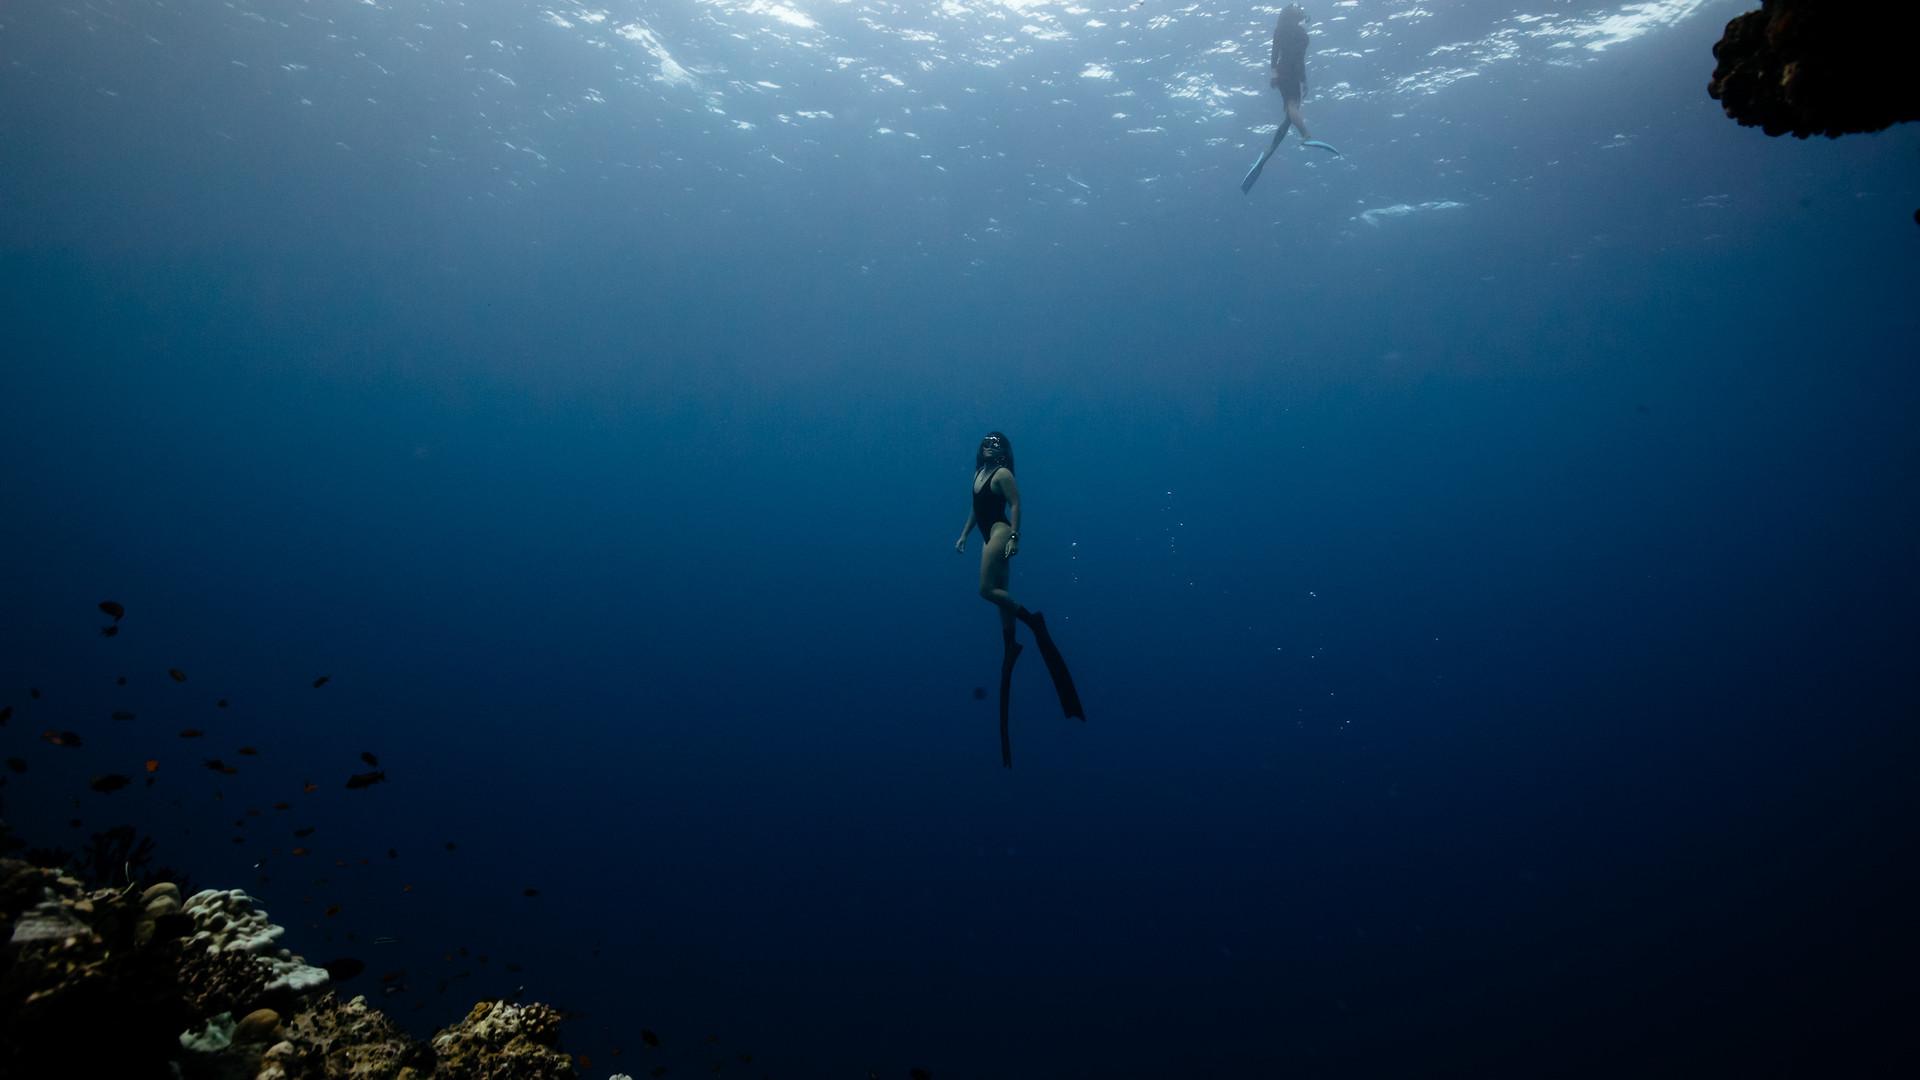 Freediving shoot with Matt Porteous